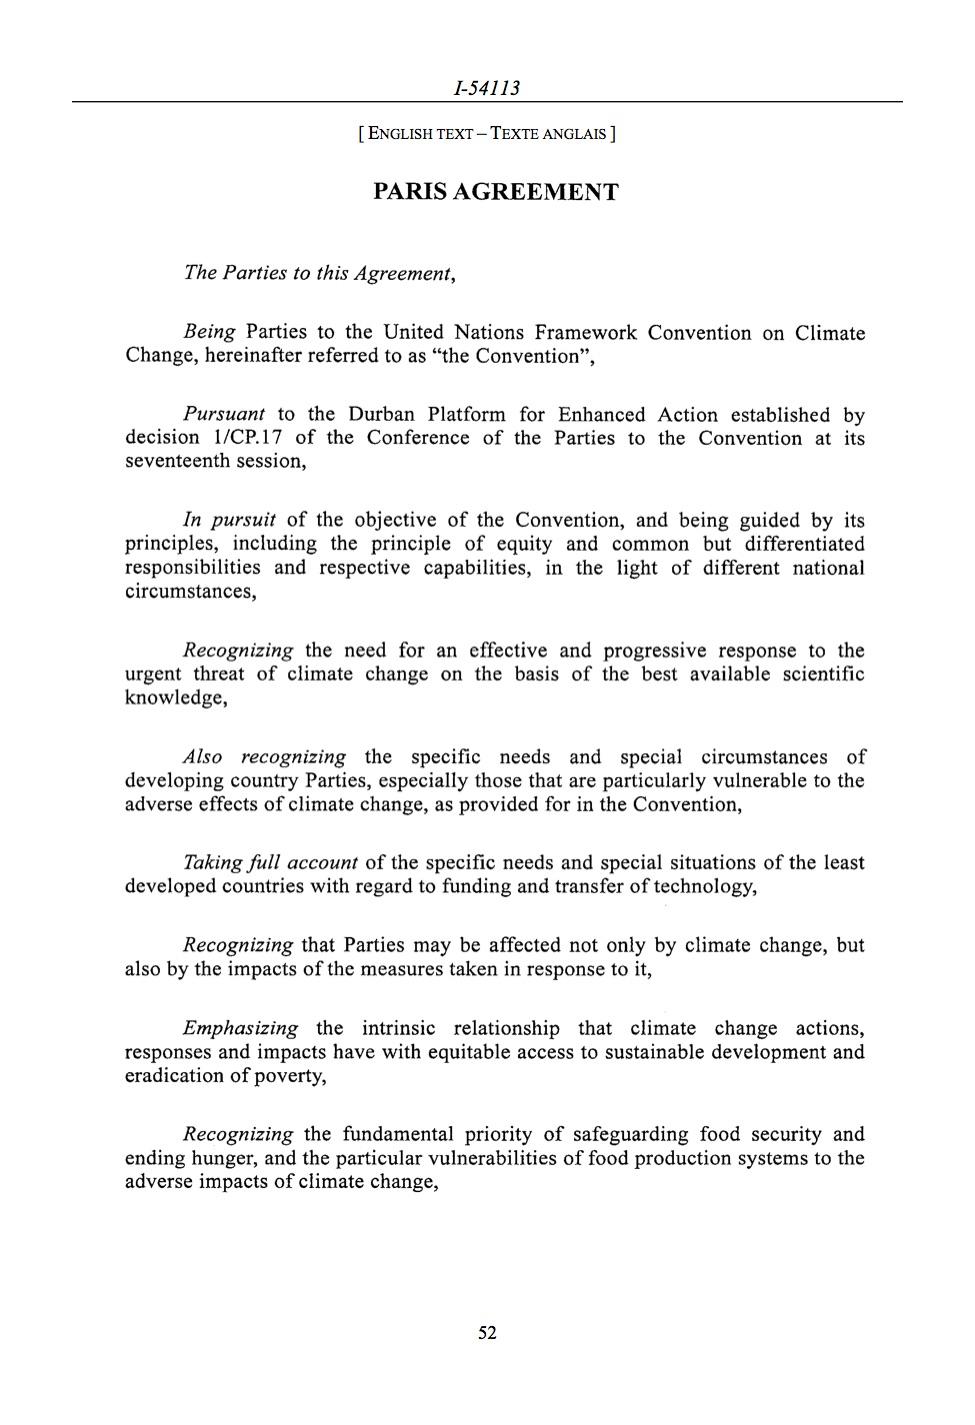 The Paris Agreement p1.jpg